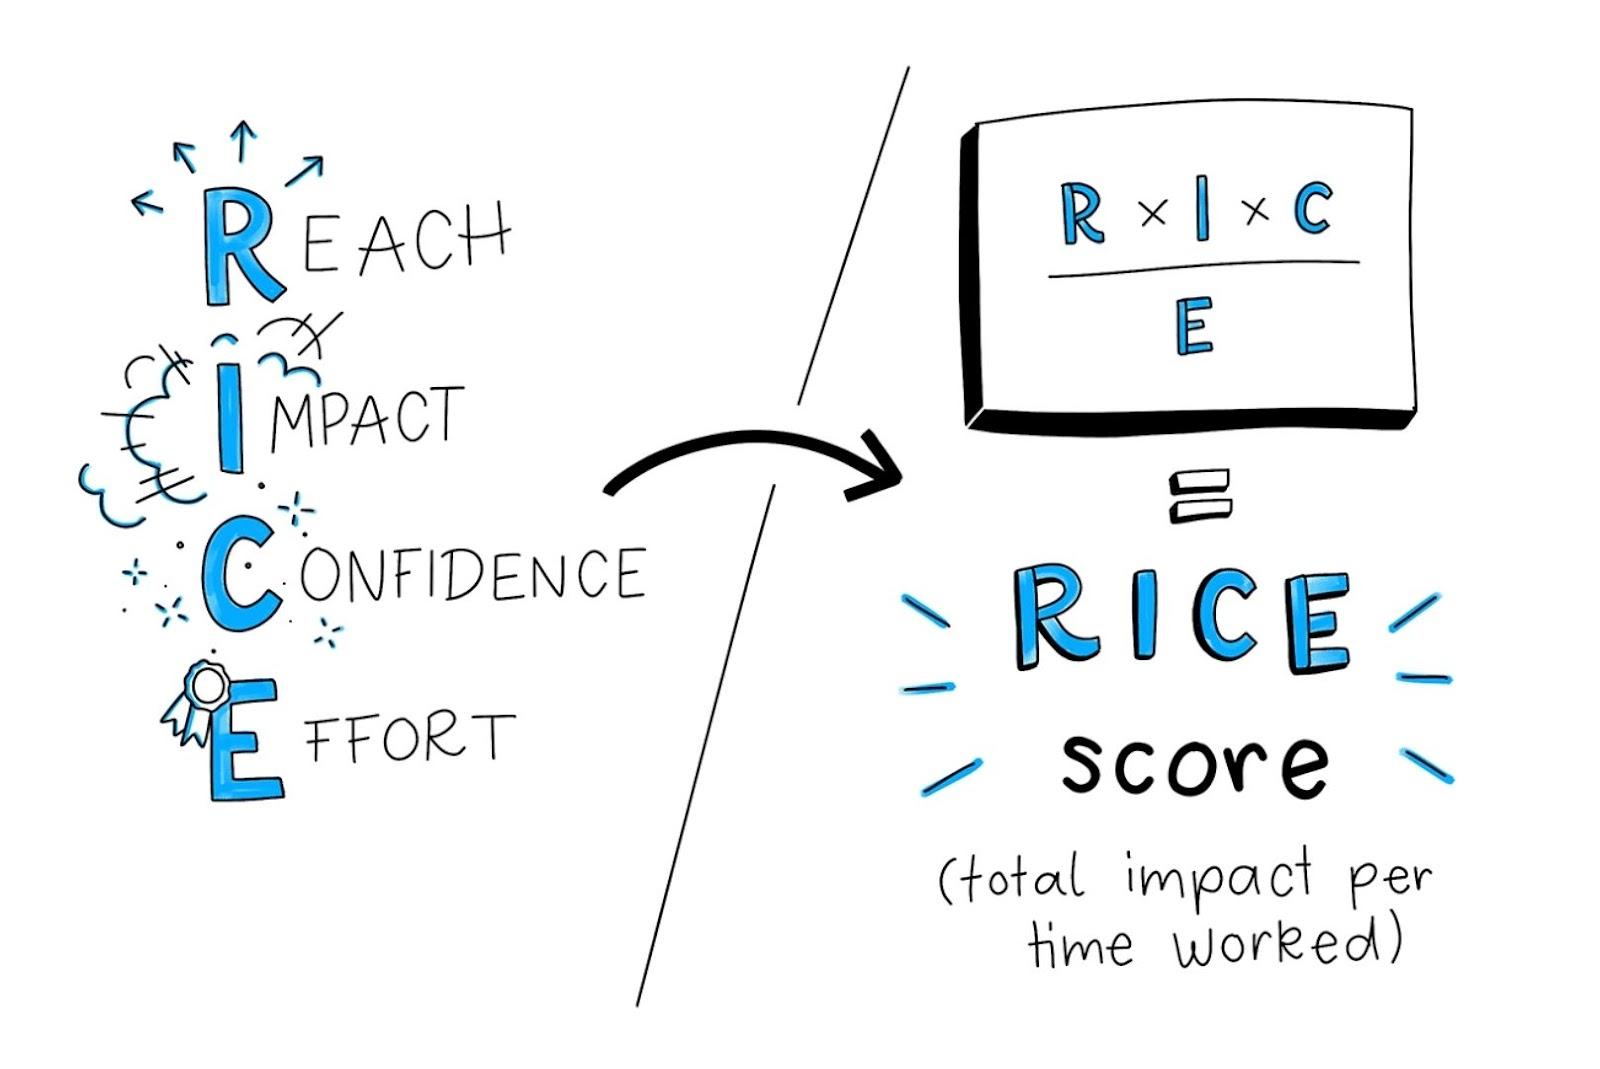 Rice score